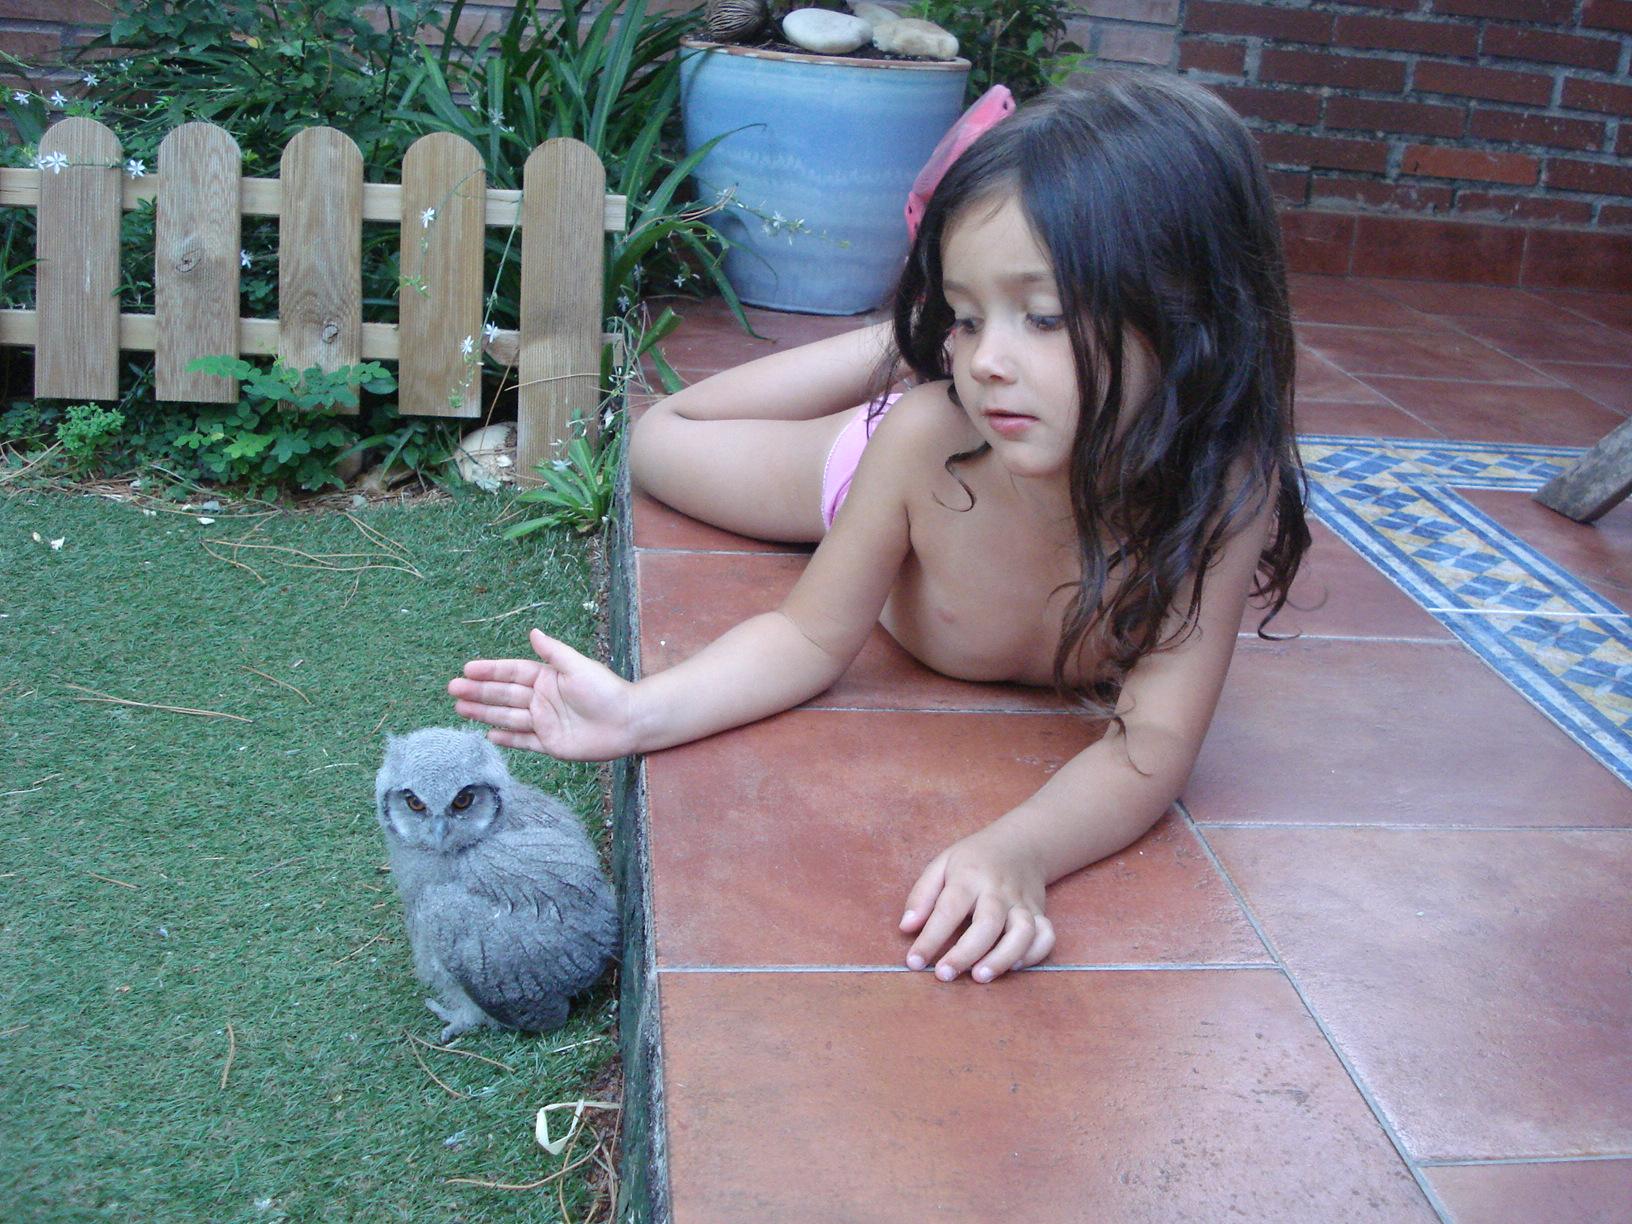 Homegrown amateur videos handjob jewelz